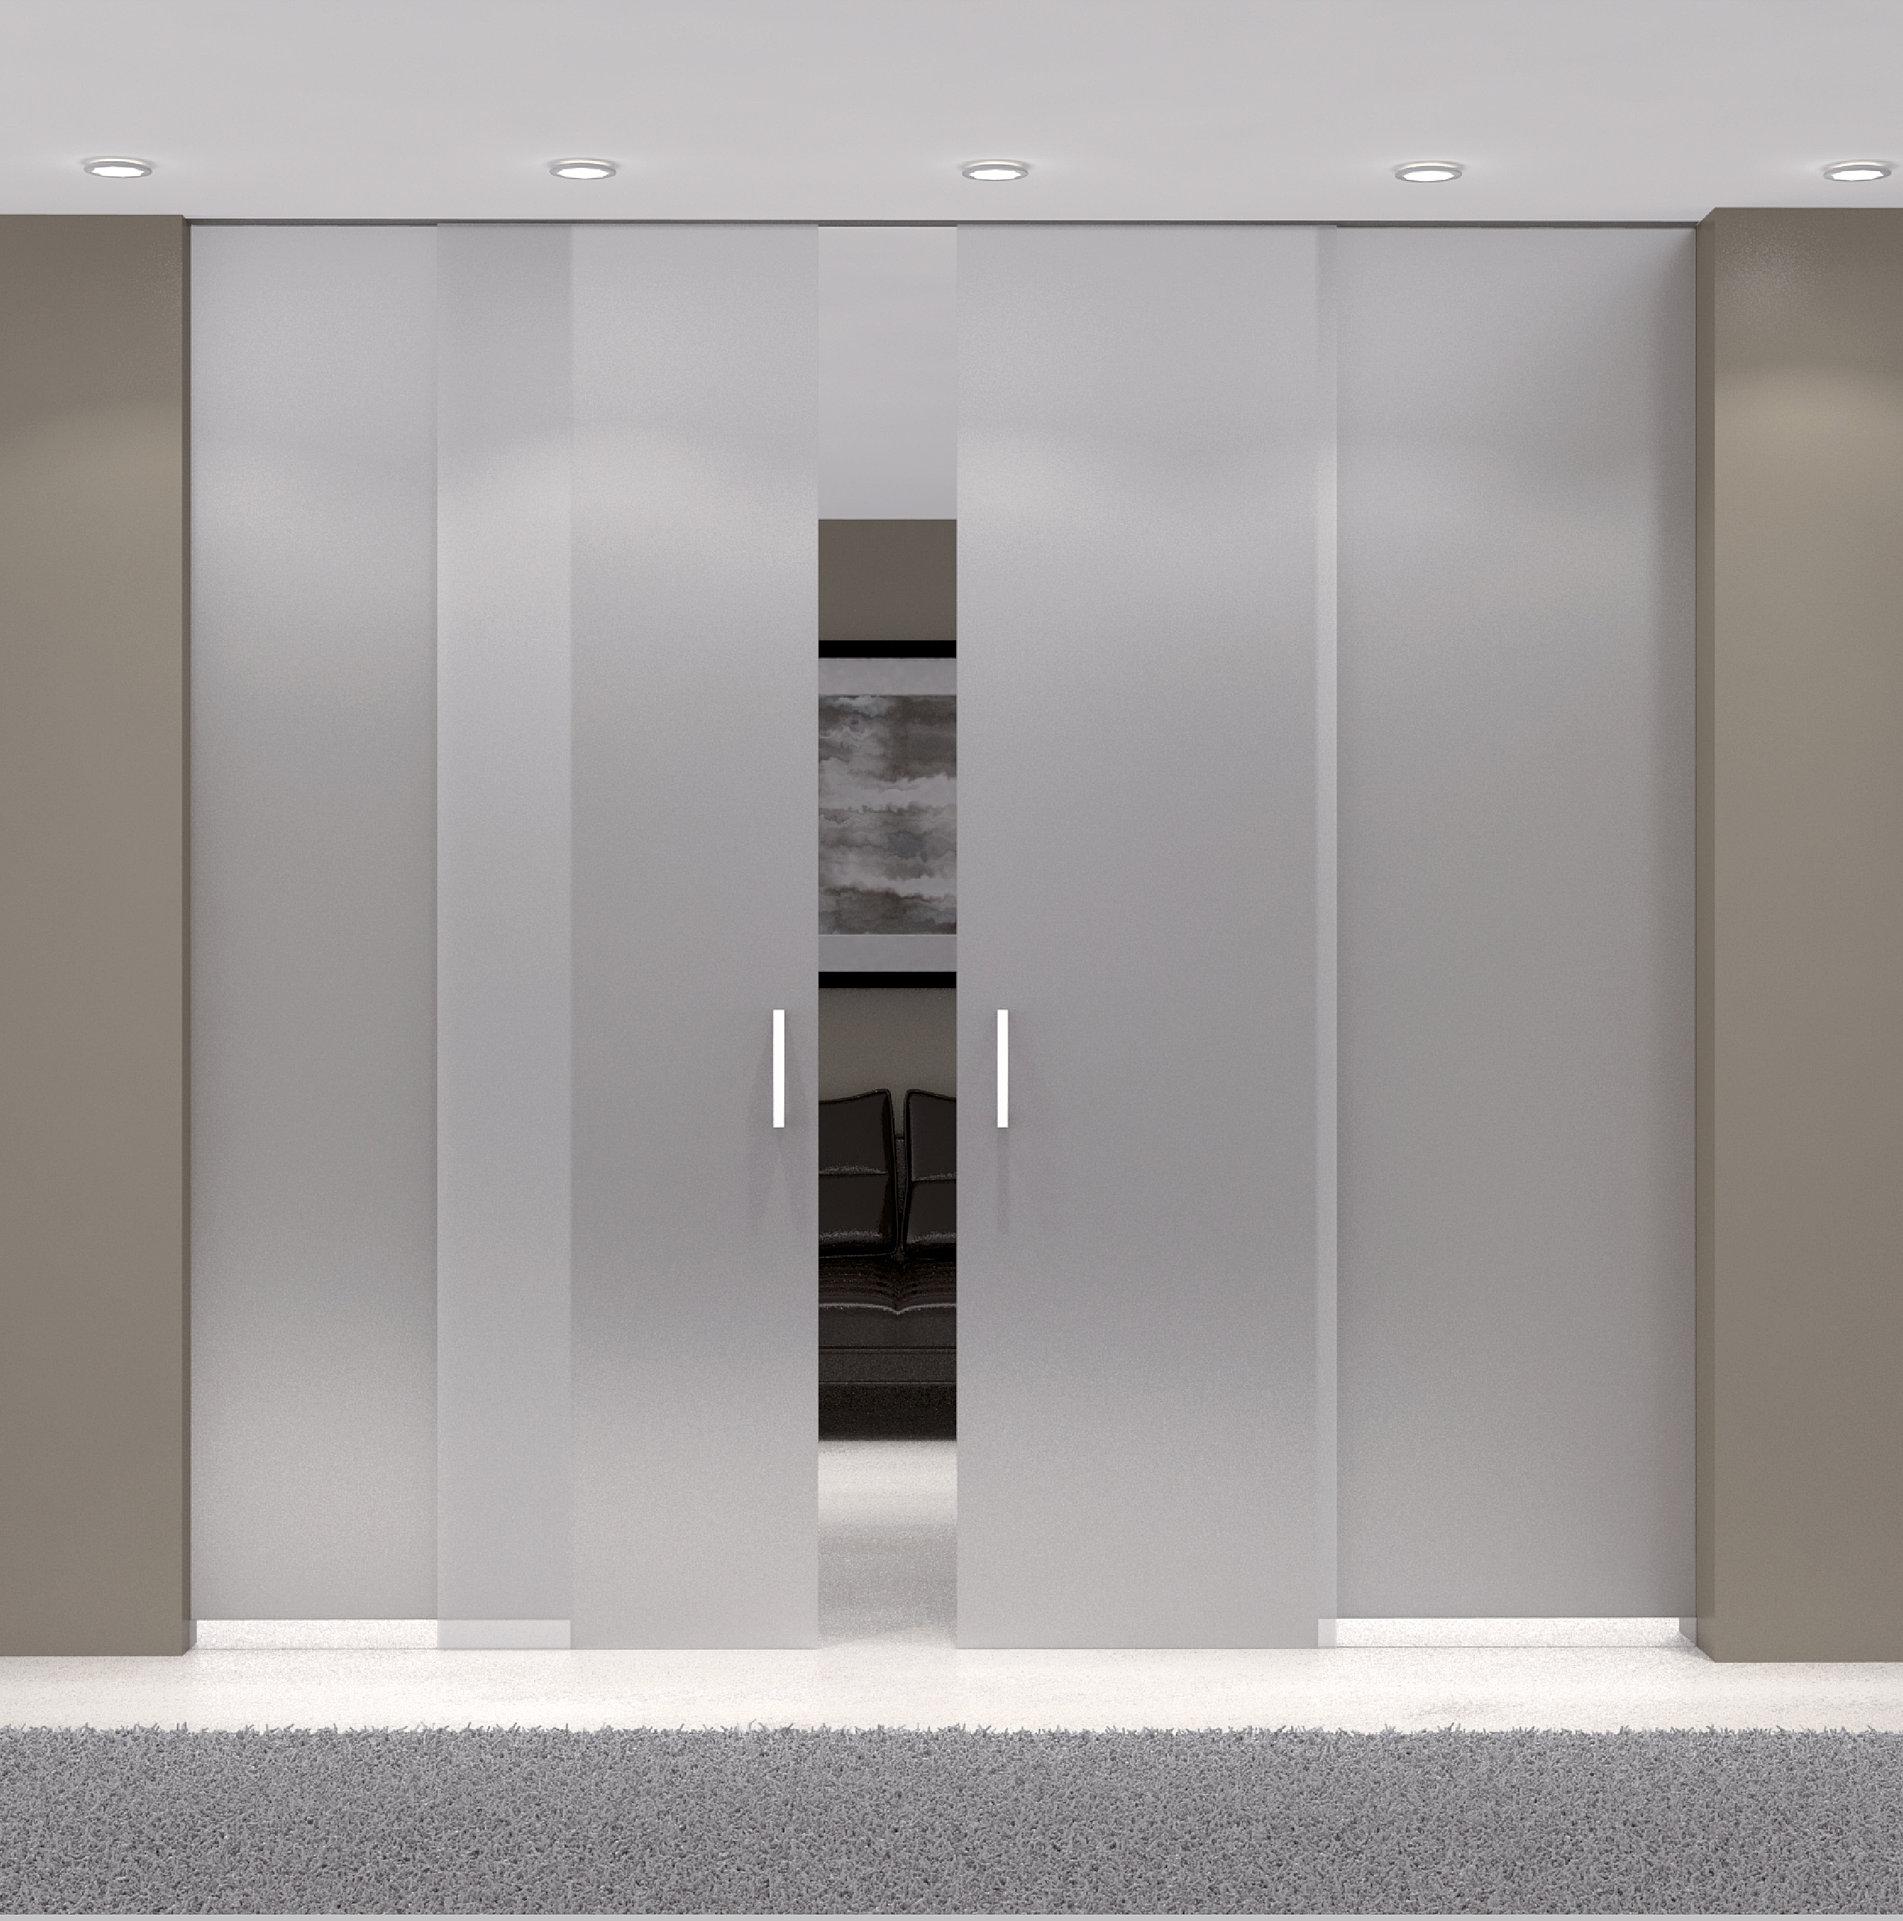 Ikea porta scorrevole for Ikea porte interne